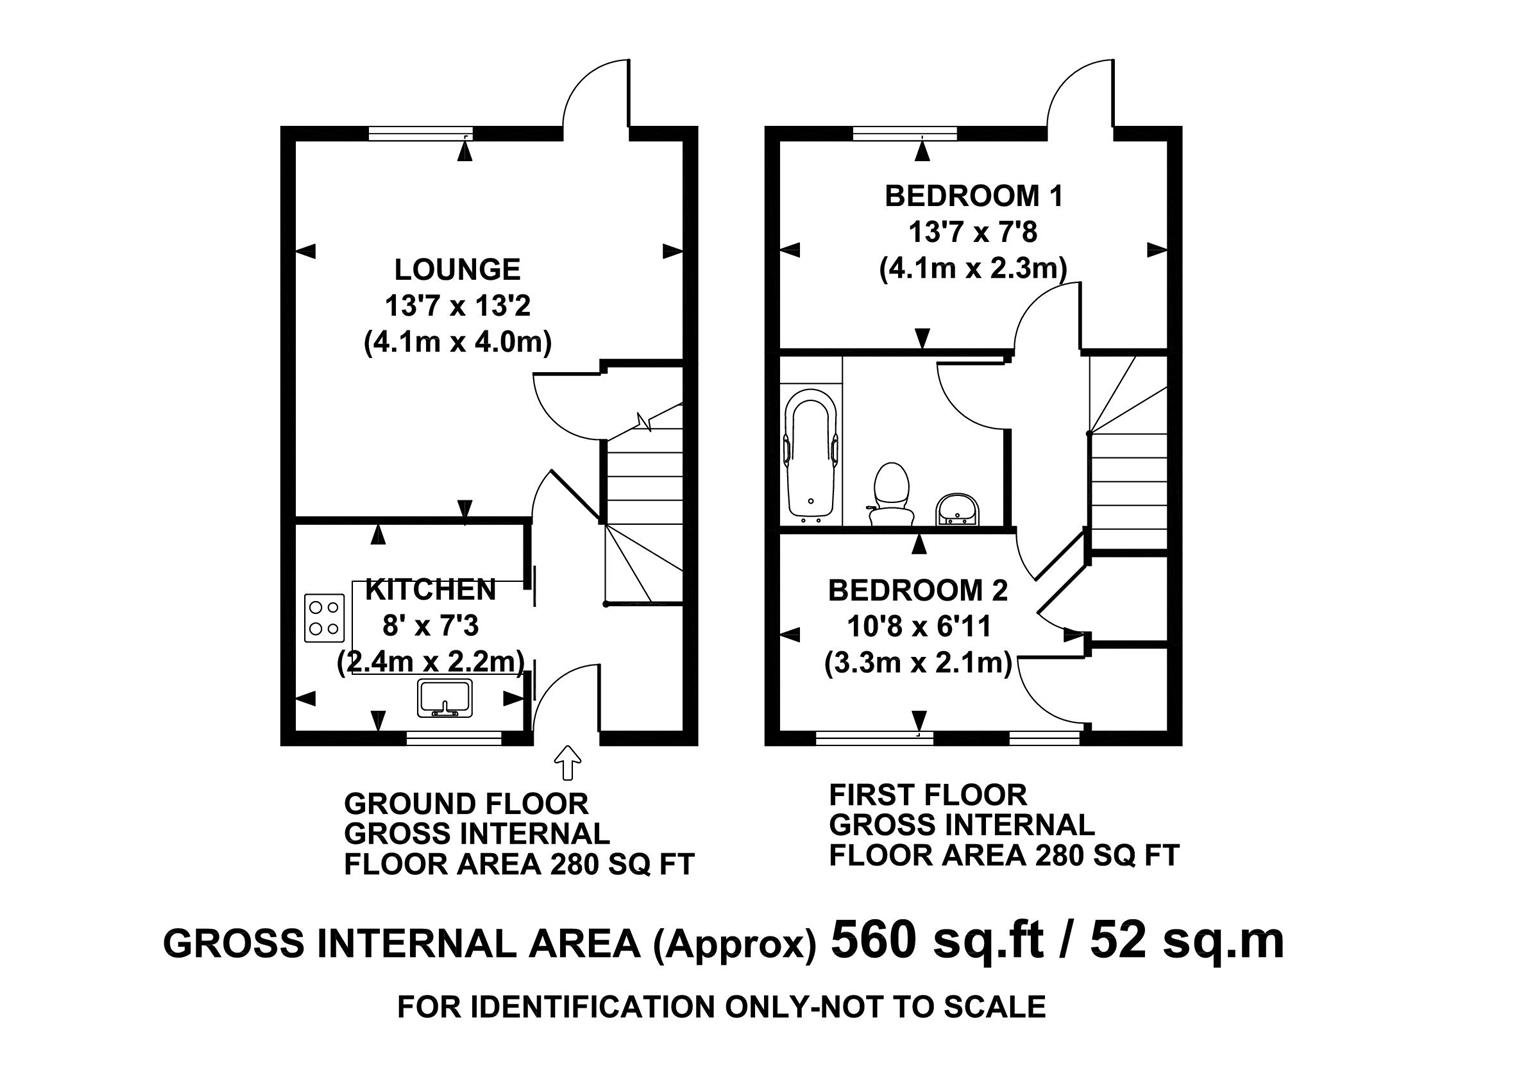 Avenue road winslow buckingham mk18 2 bedroom terraced for Buckingham choice floor plans